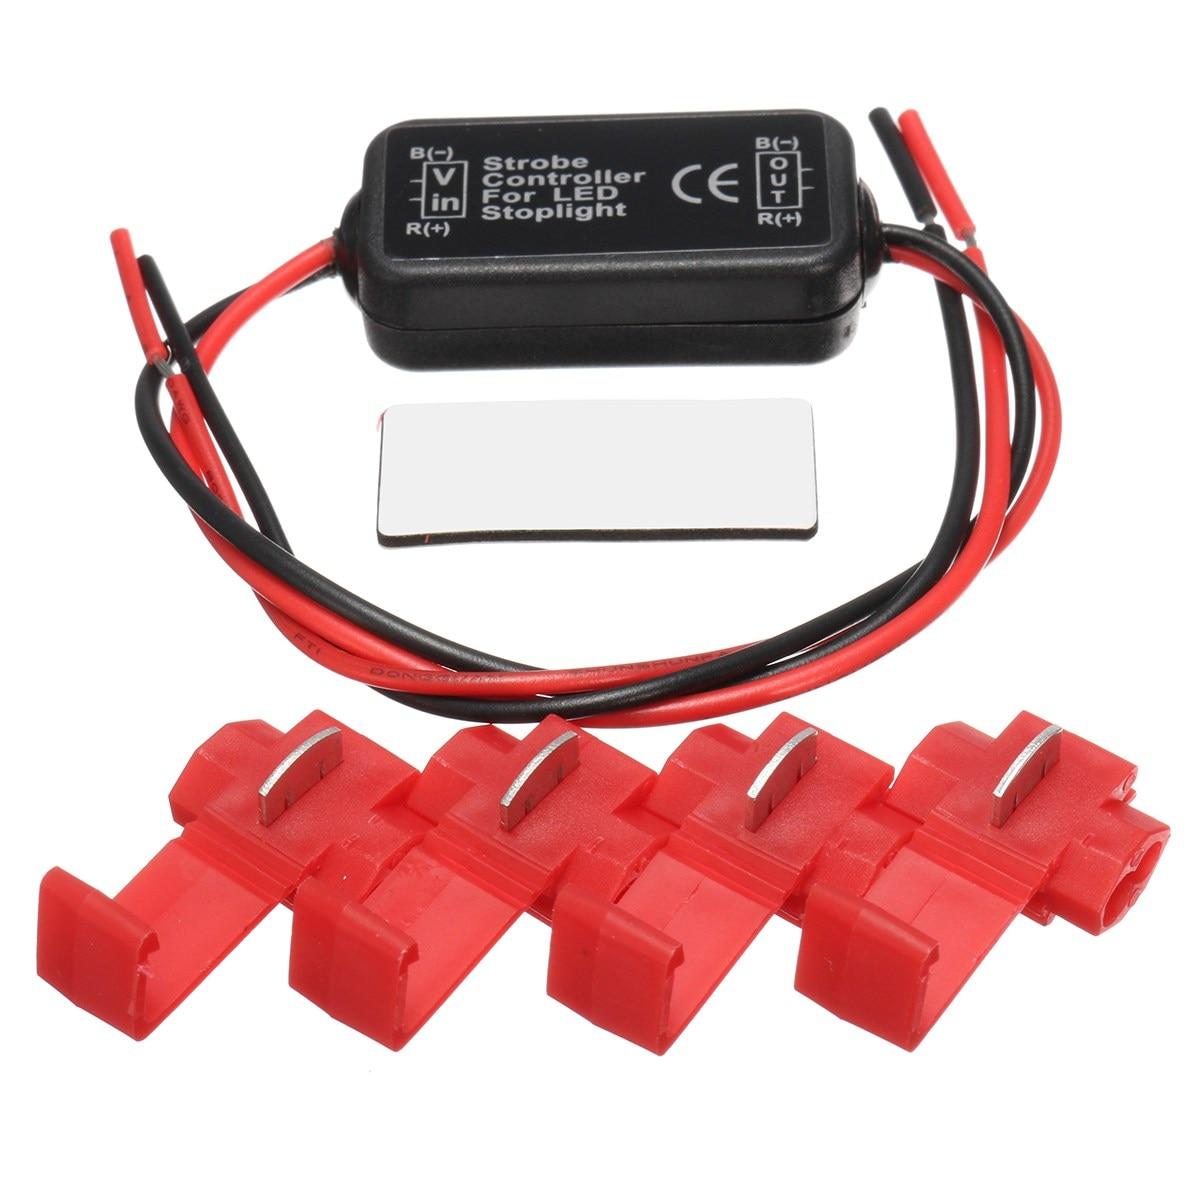 KROAK 20W LED Brake Stop Flash Strobe Light Controller Flasher Module Controller Box For Car Truck Light